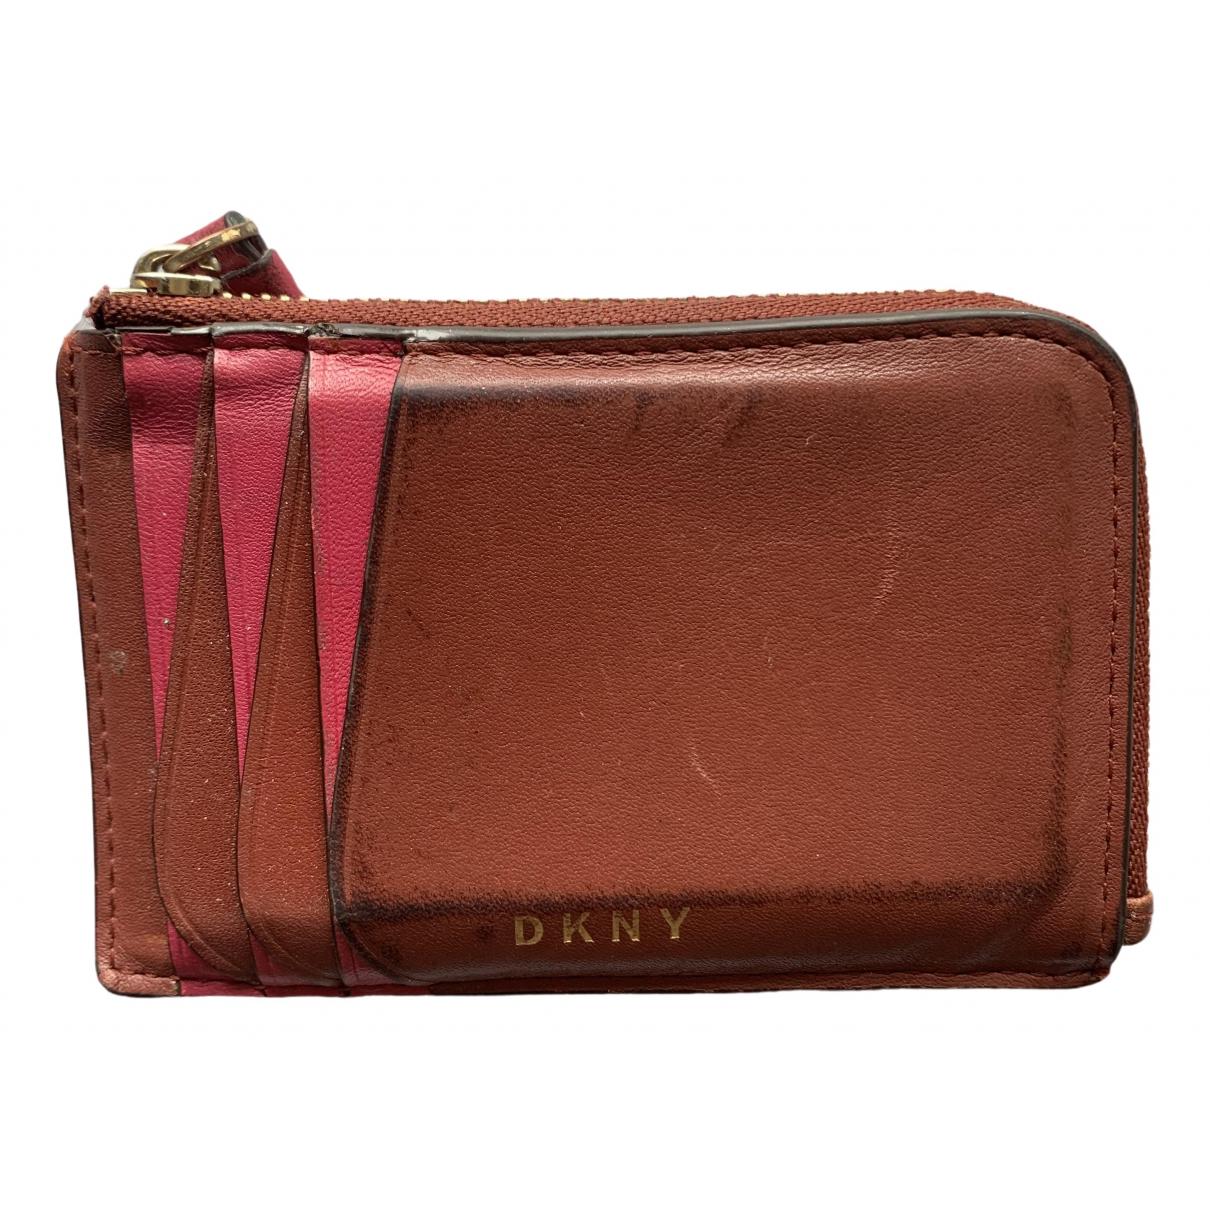 Dkny \N Portemonnaie in  Braun Leder